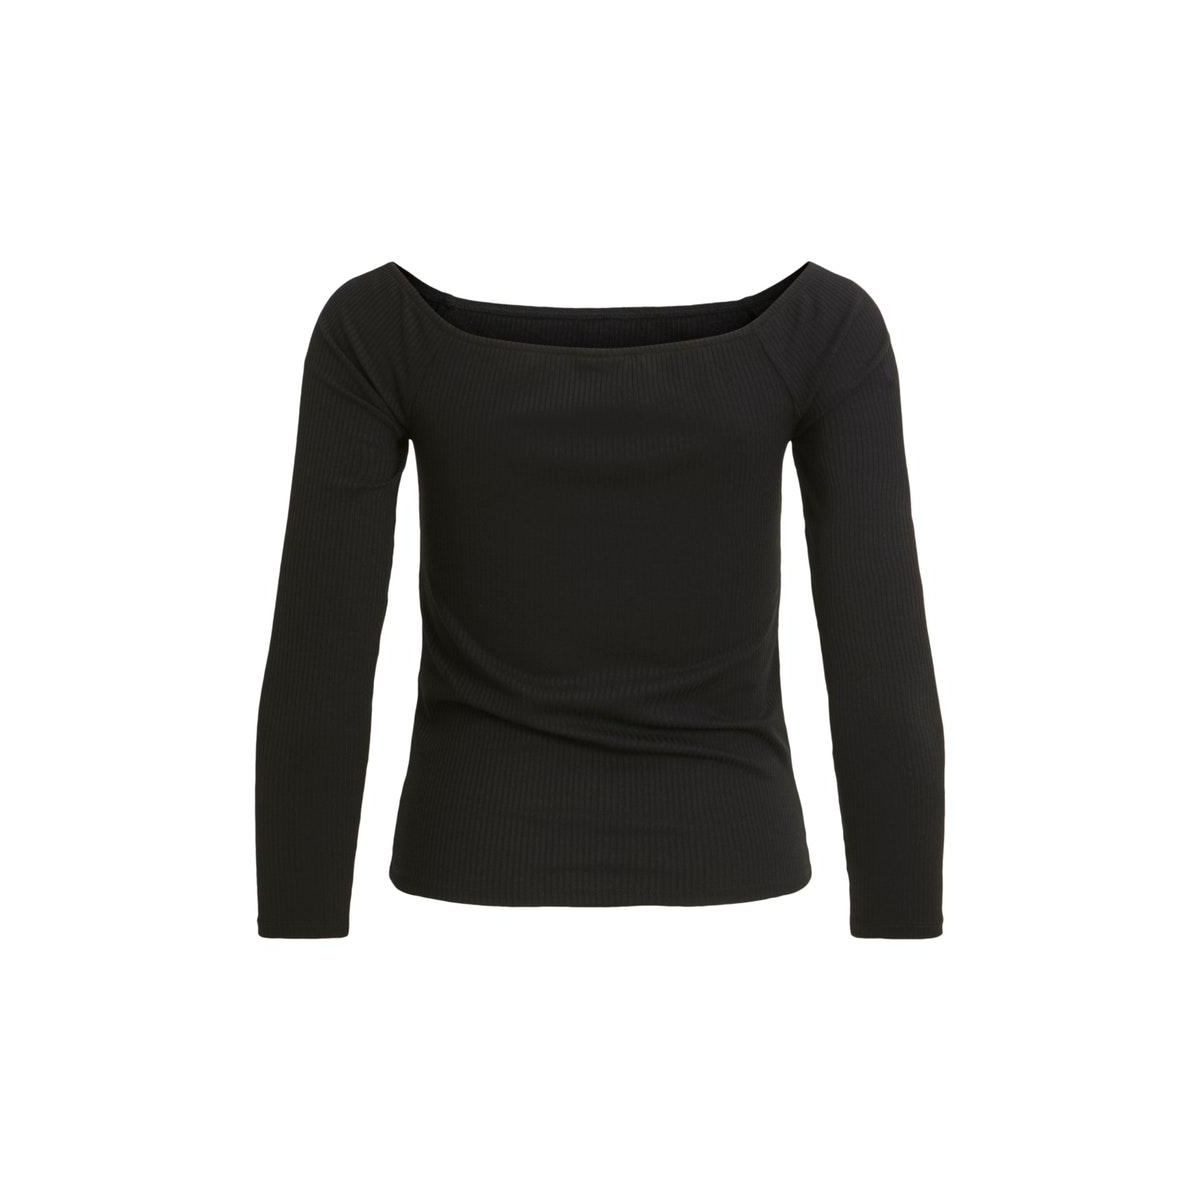 viedel l/s offshoulder rib top/za 14057935 vila t-shirt black